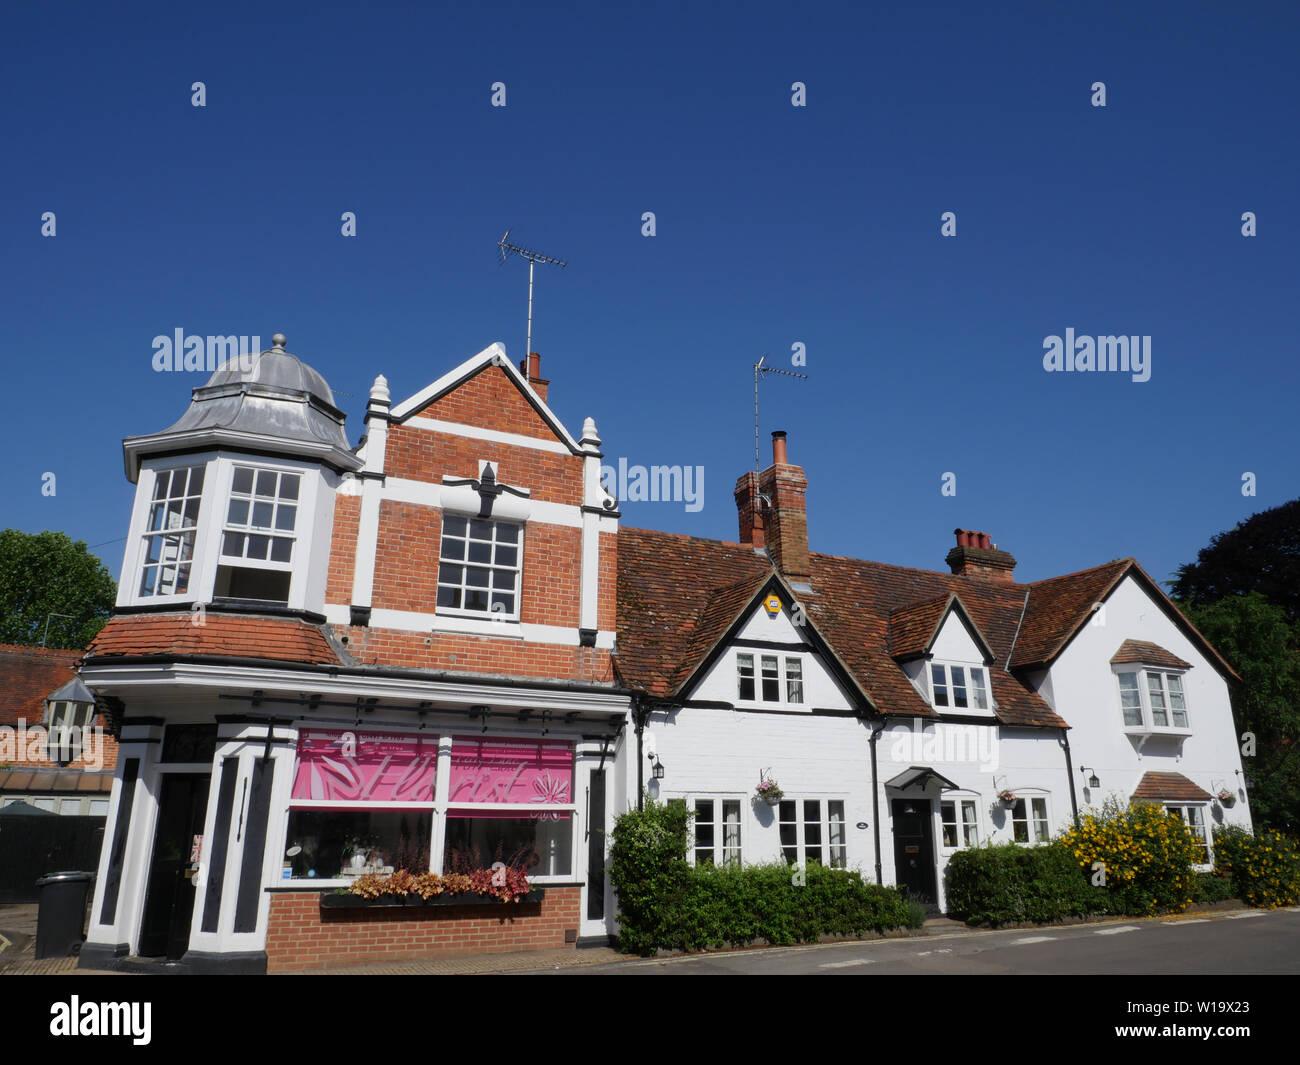 Ferry Lane Florist, Ferry Lane, Goring-on-Thames, Oxfordshire, England, UK, GB. Stock Photo